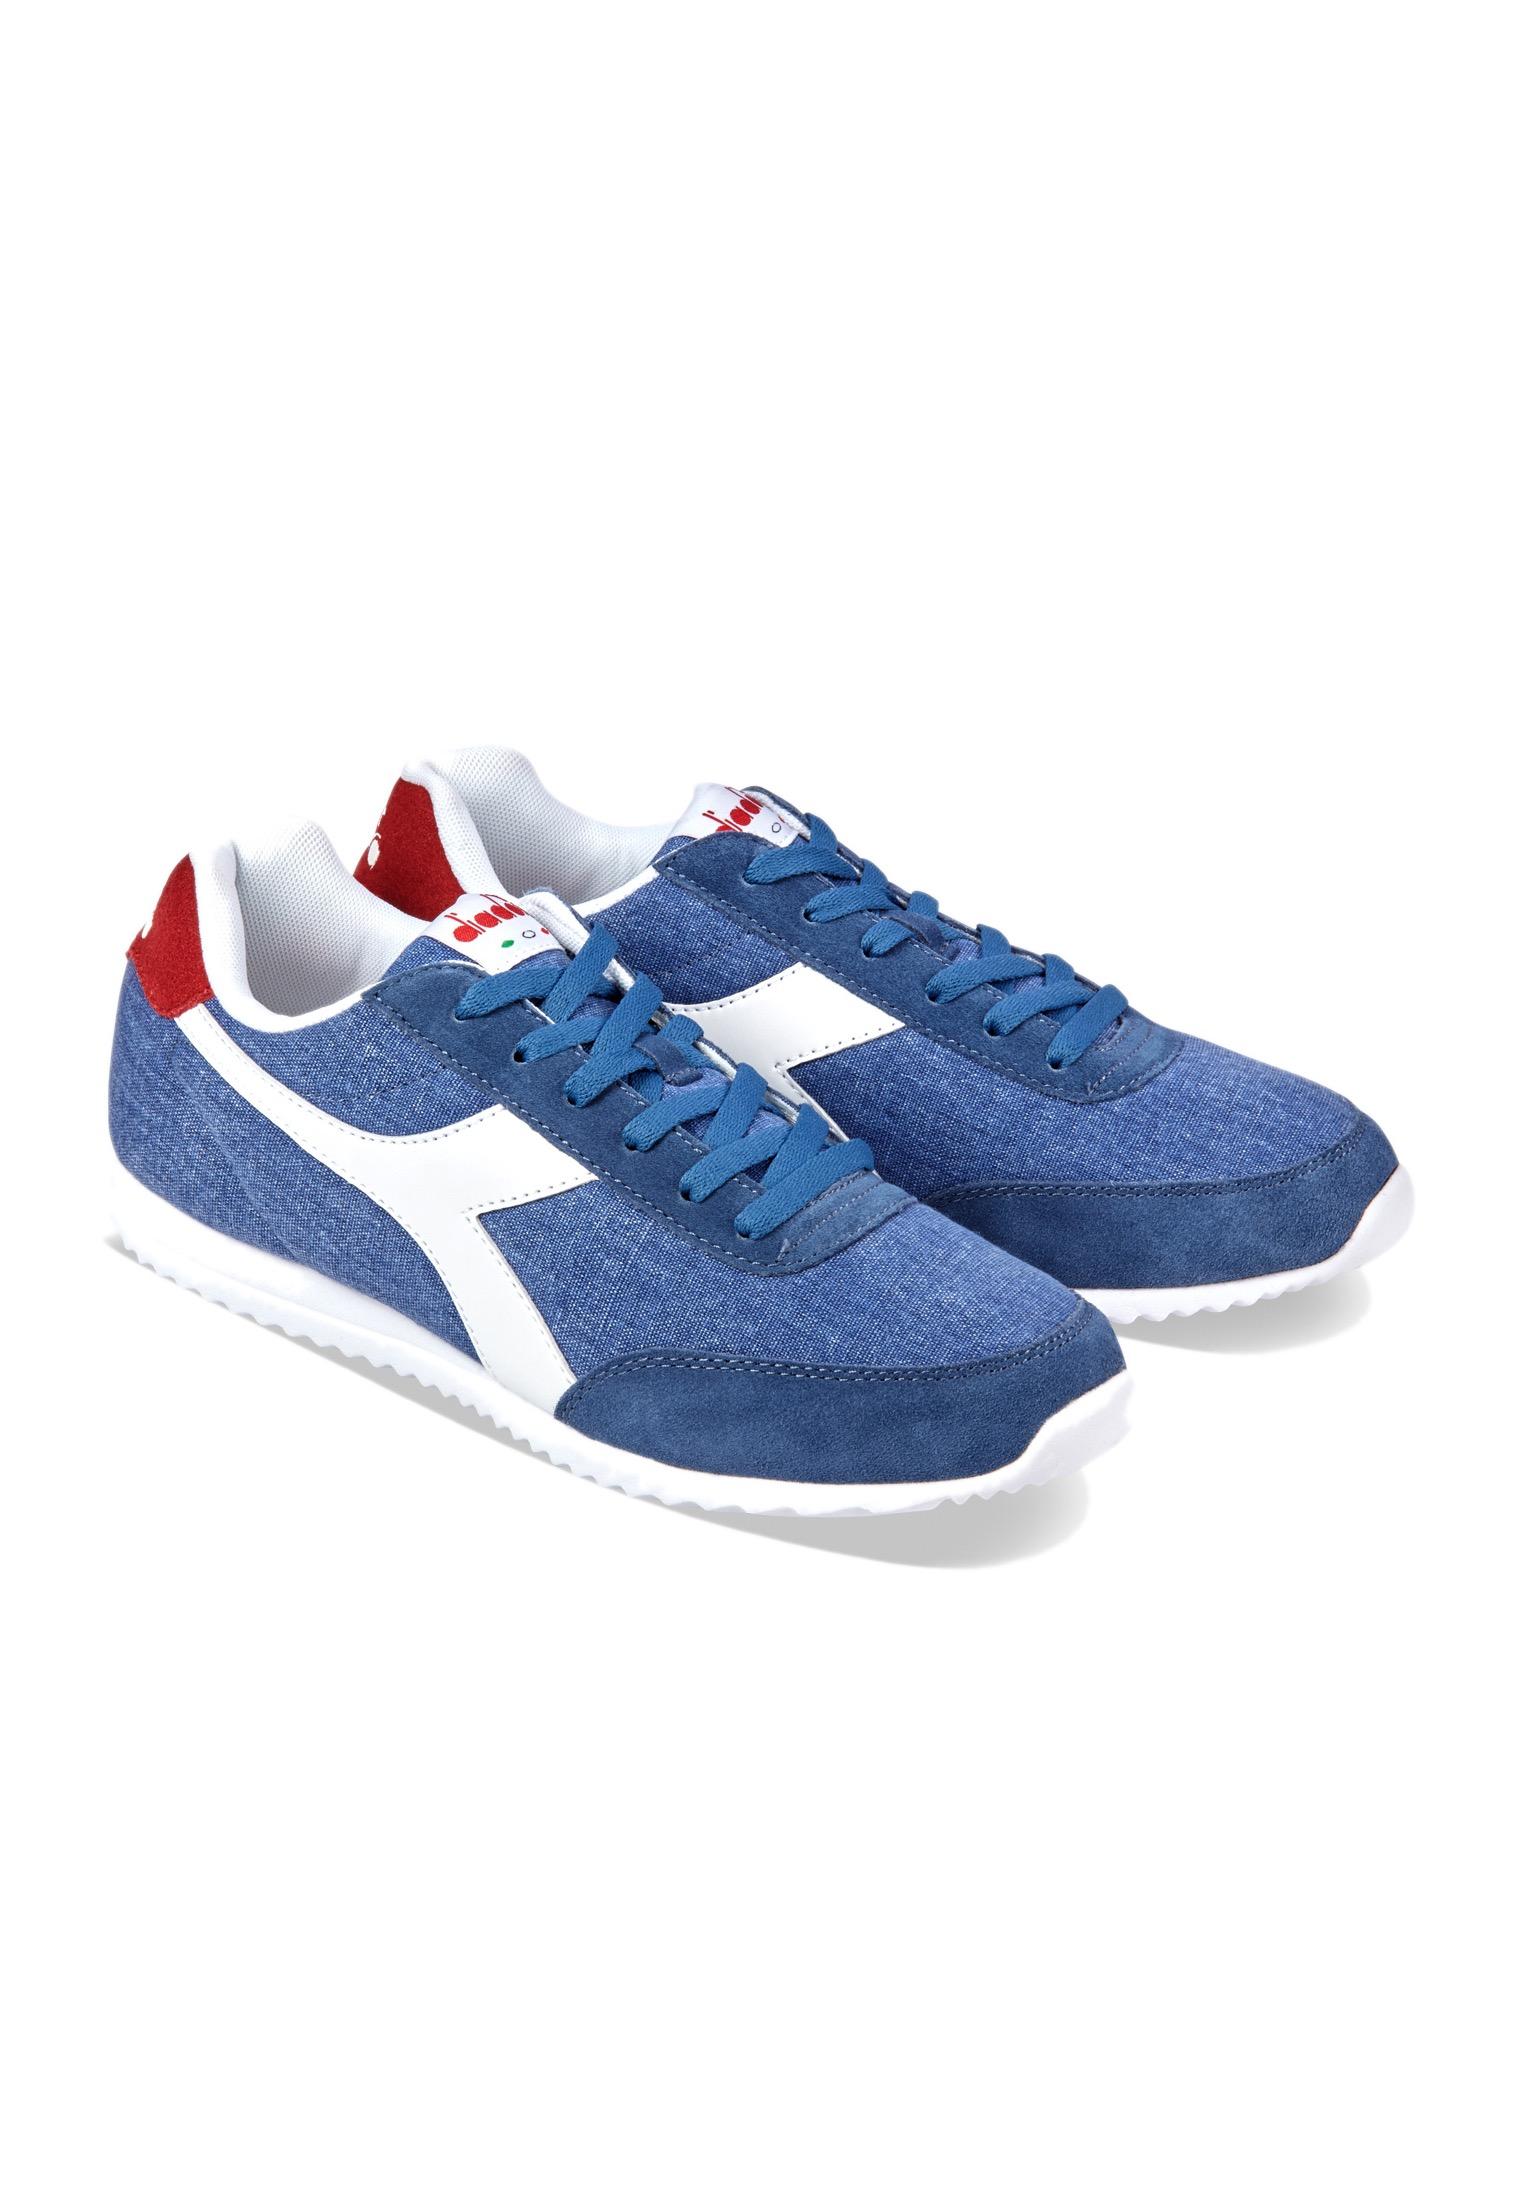 Scarpe-Diadora-Jog-Light-C-Sneakers-sportive-uomo-donna-vari-colori-e-taglie miniatura 35